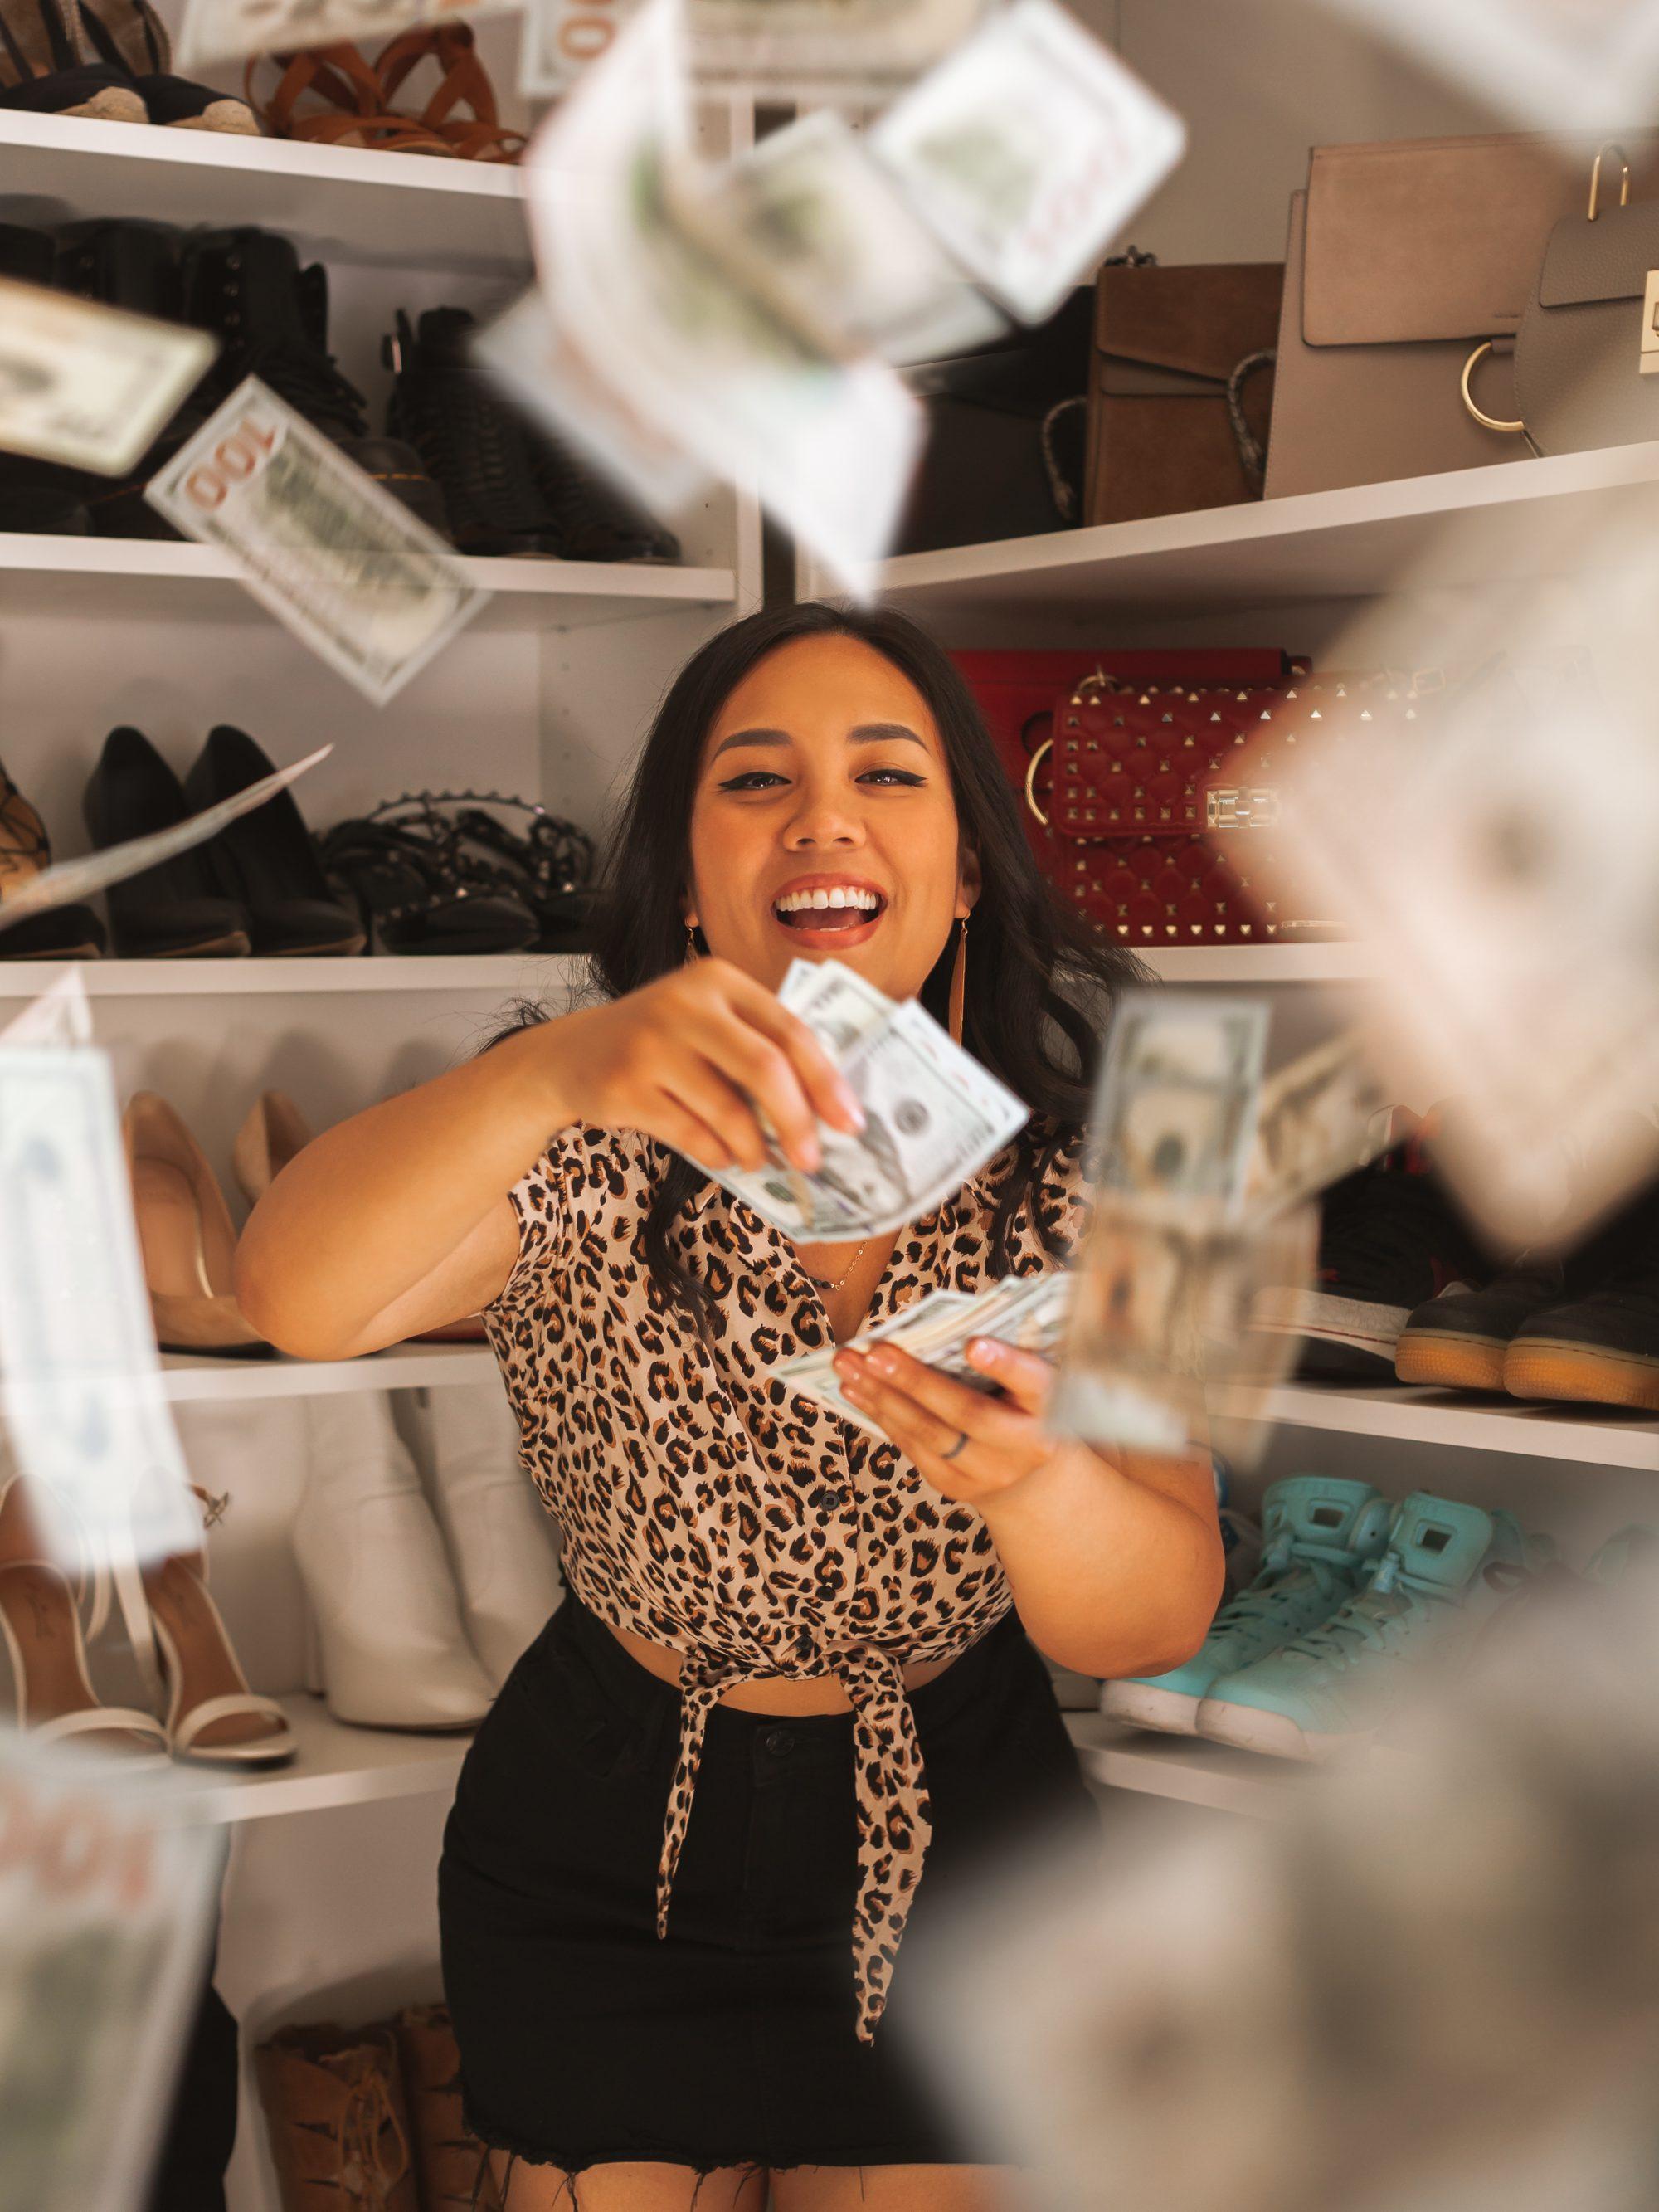 Rich woman throwing dollar bills in the air